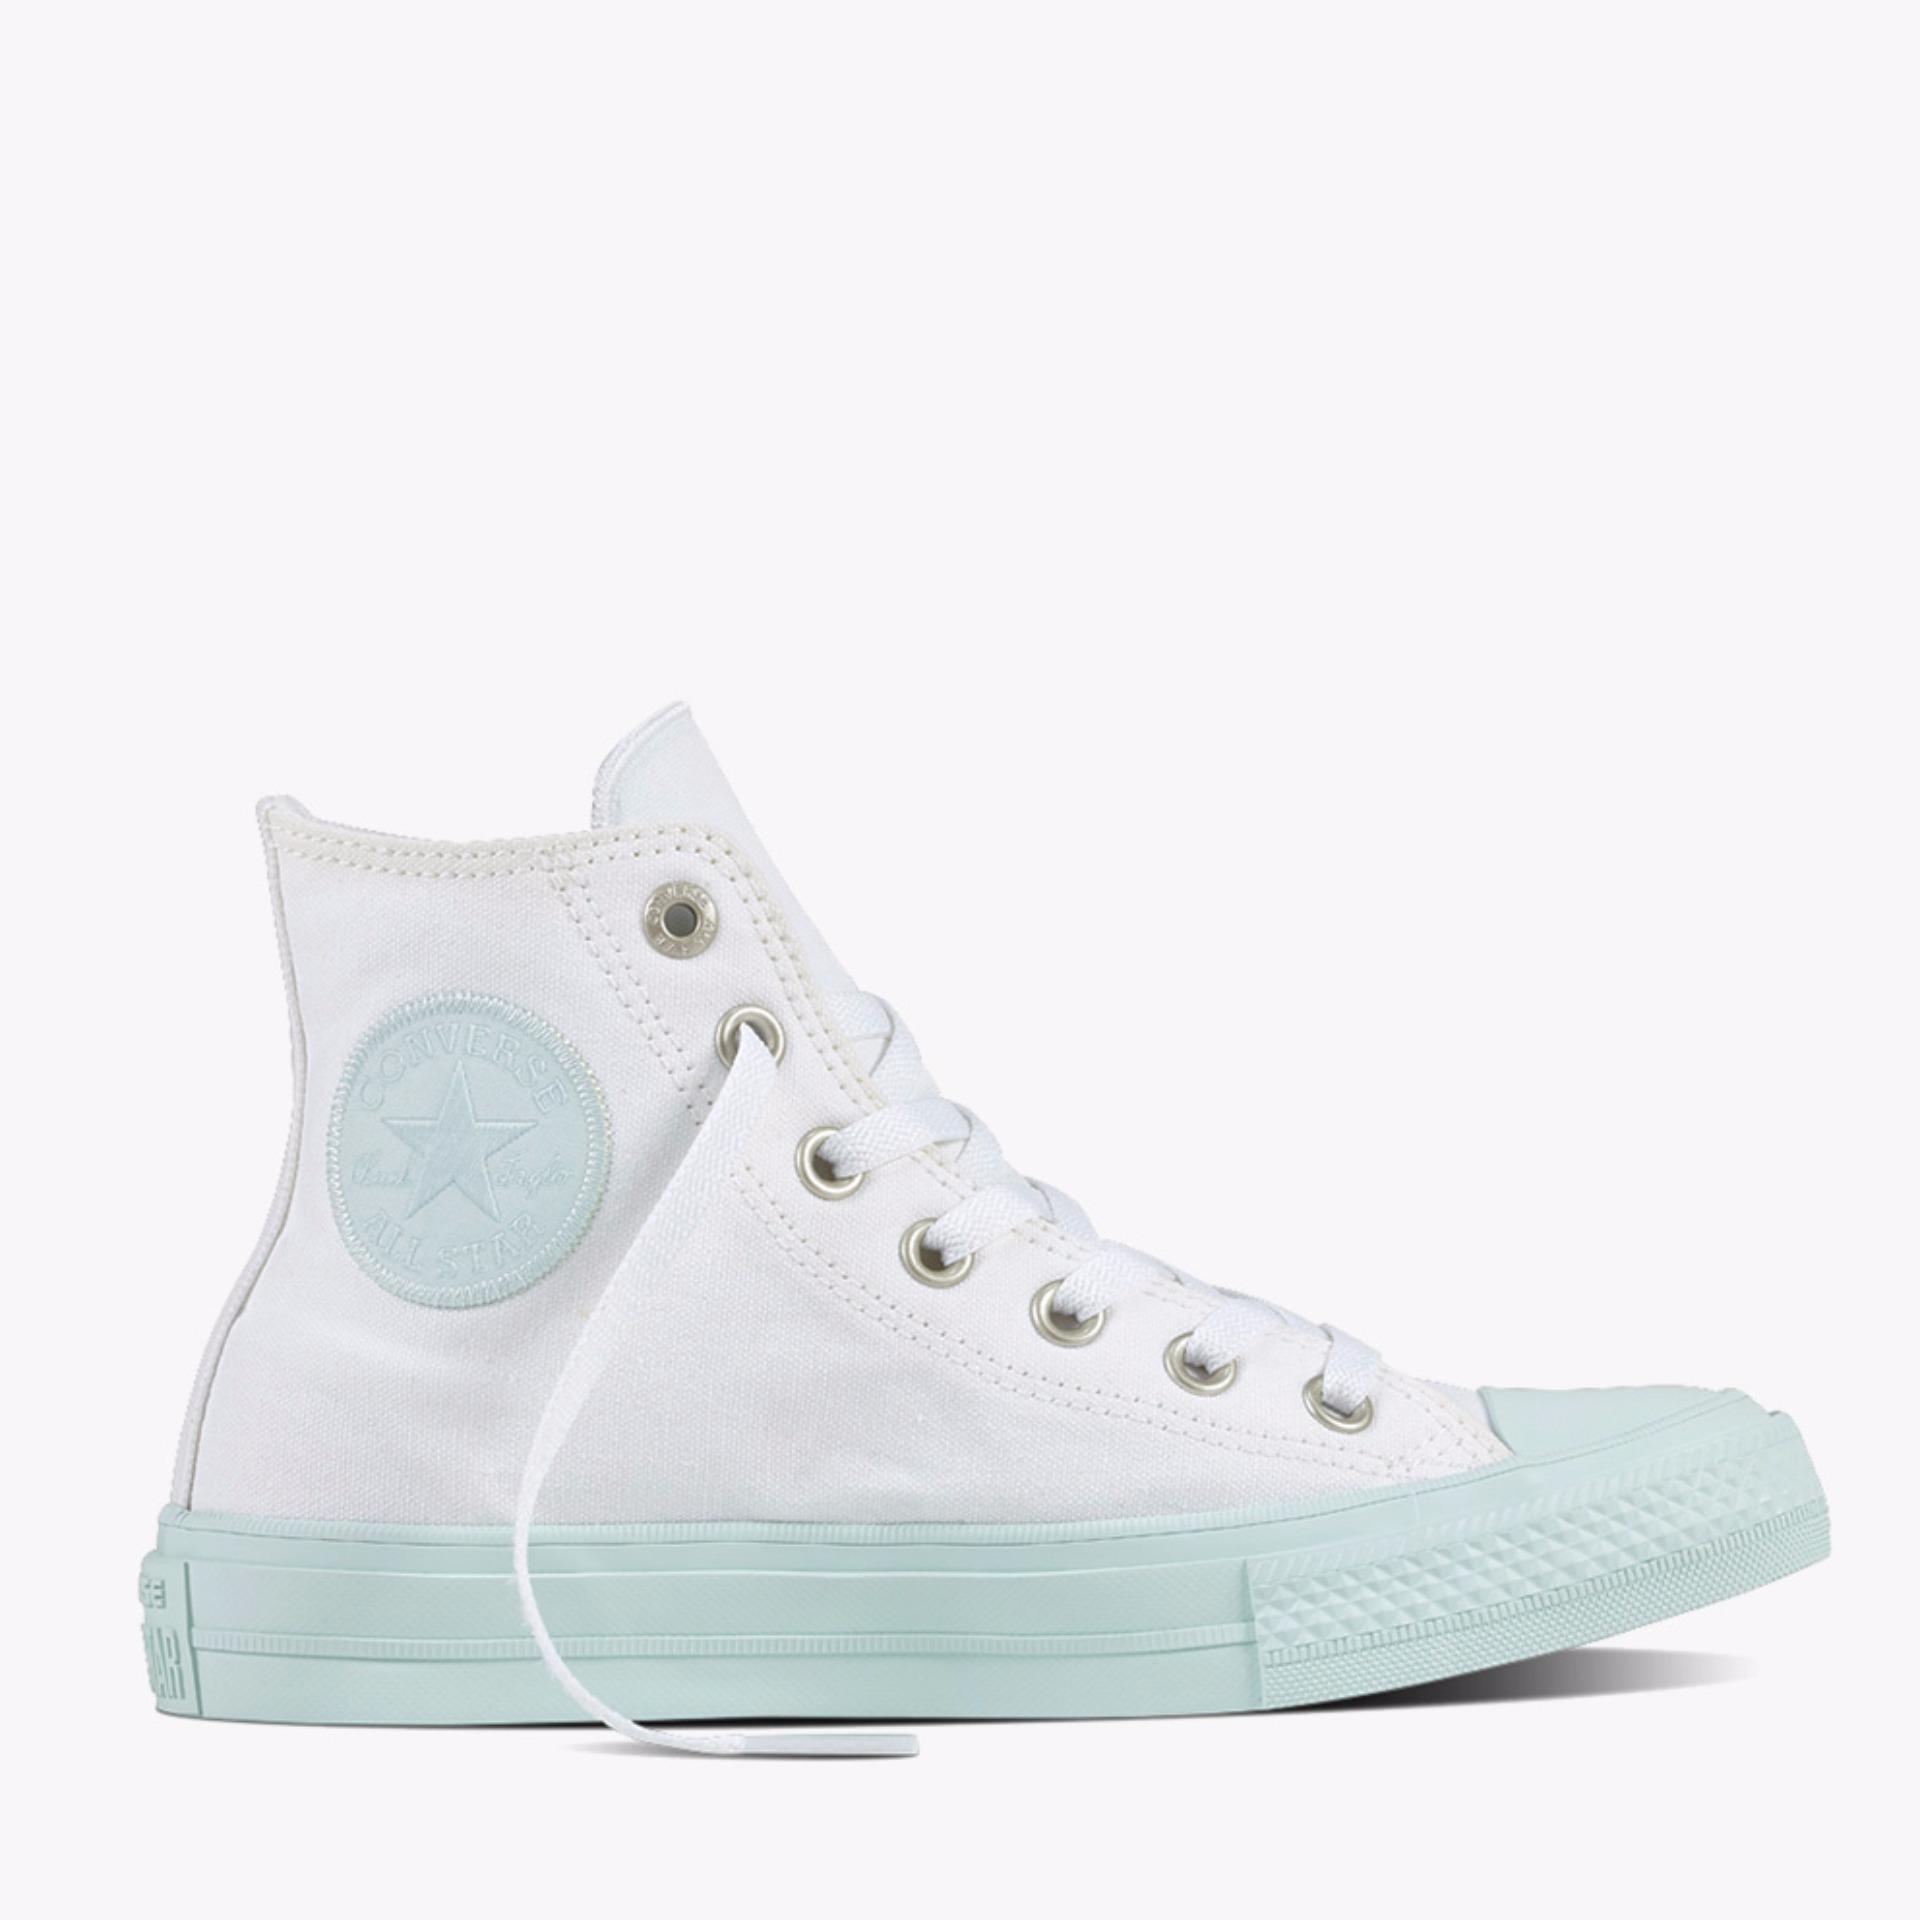 Converse Chuck Taylor All Star II Hi Women s Sneaker Shoes - Putih . 0a0e82e28a